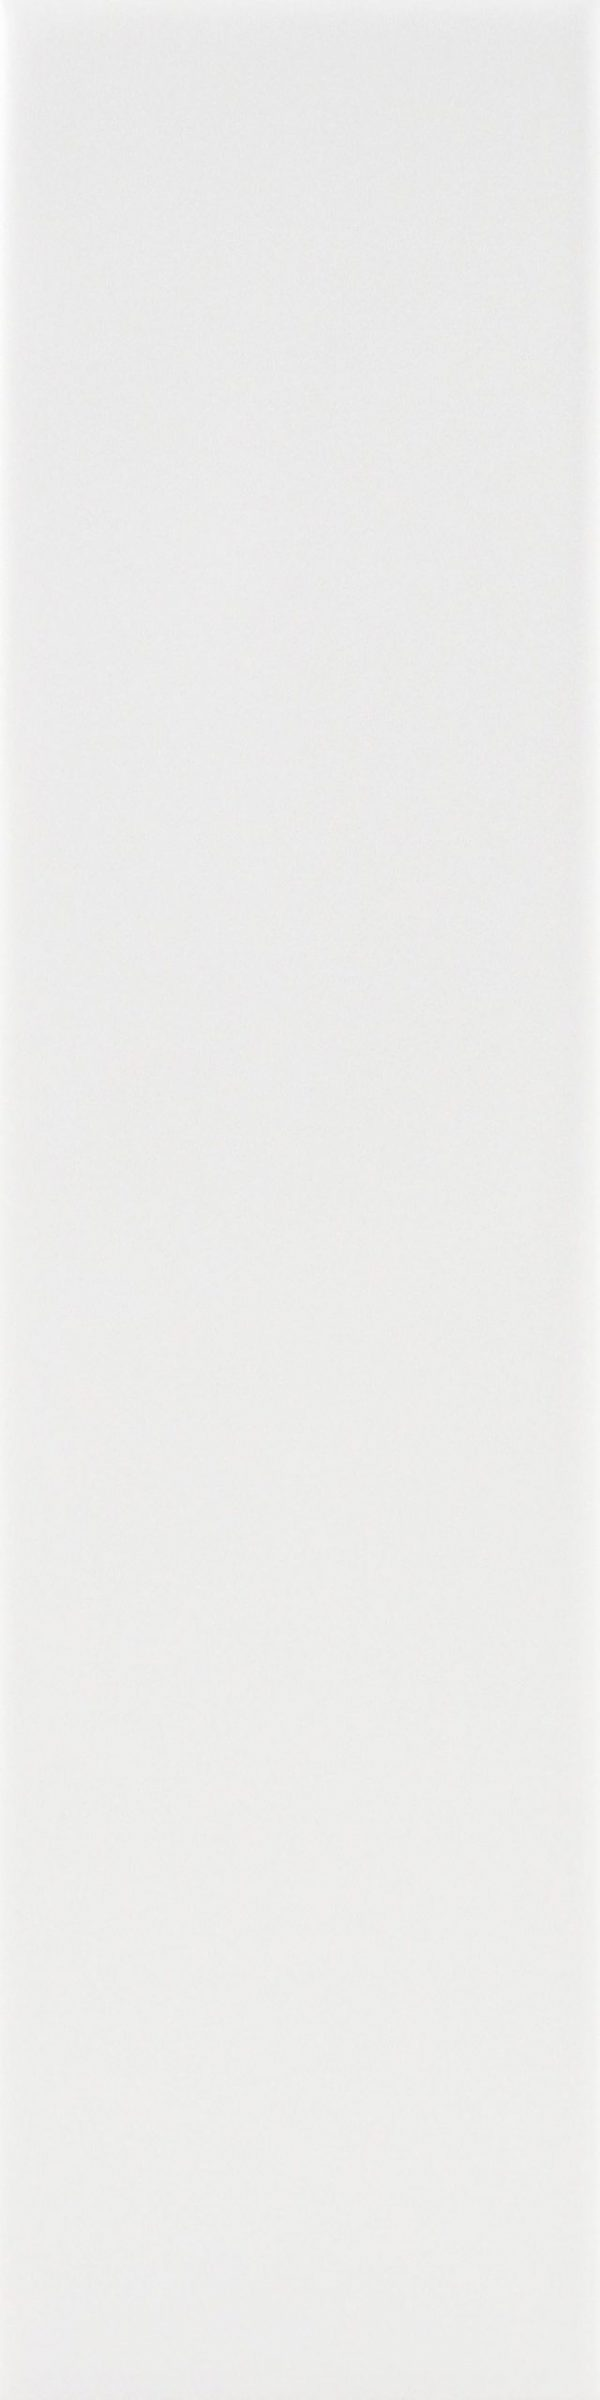 Gradient - White Matt